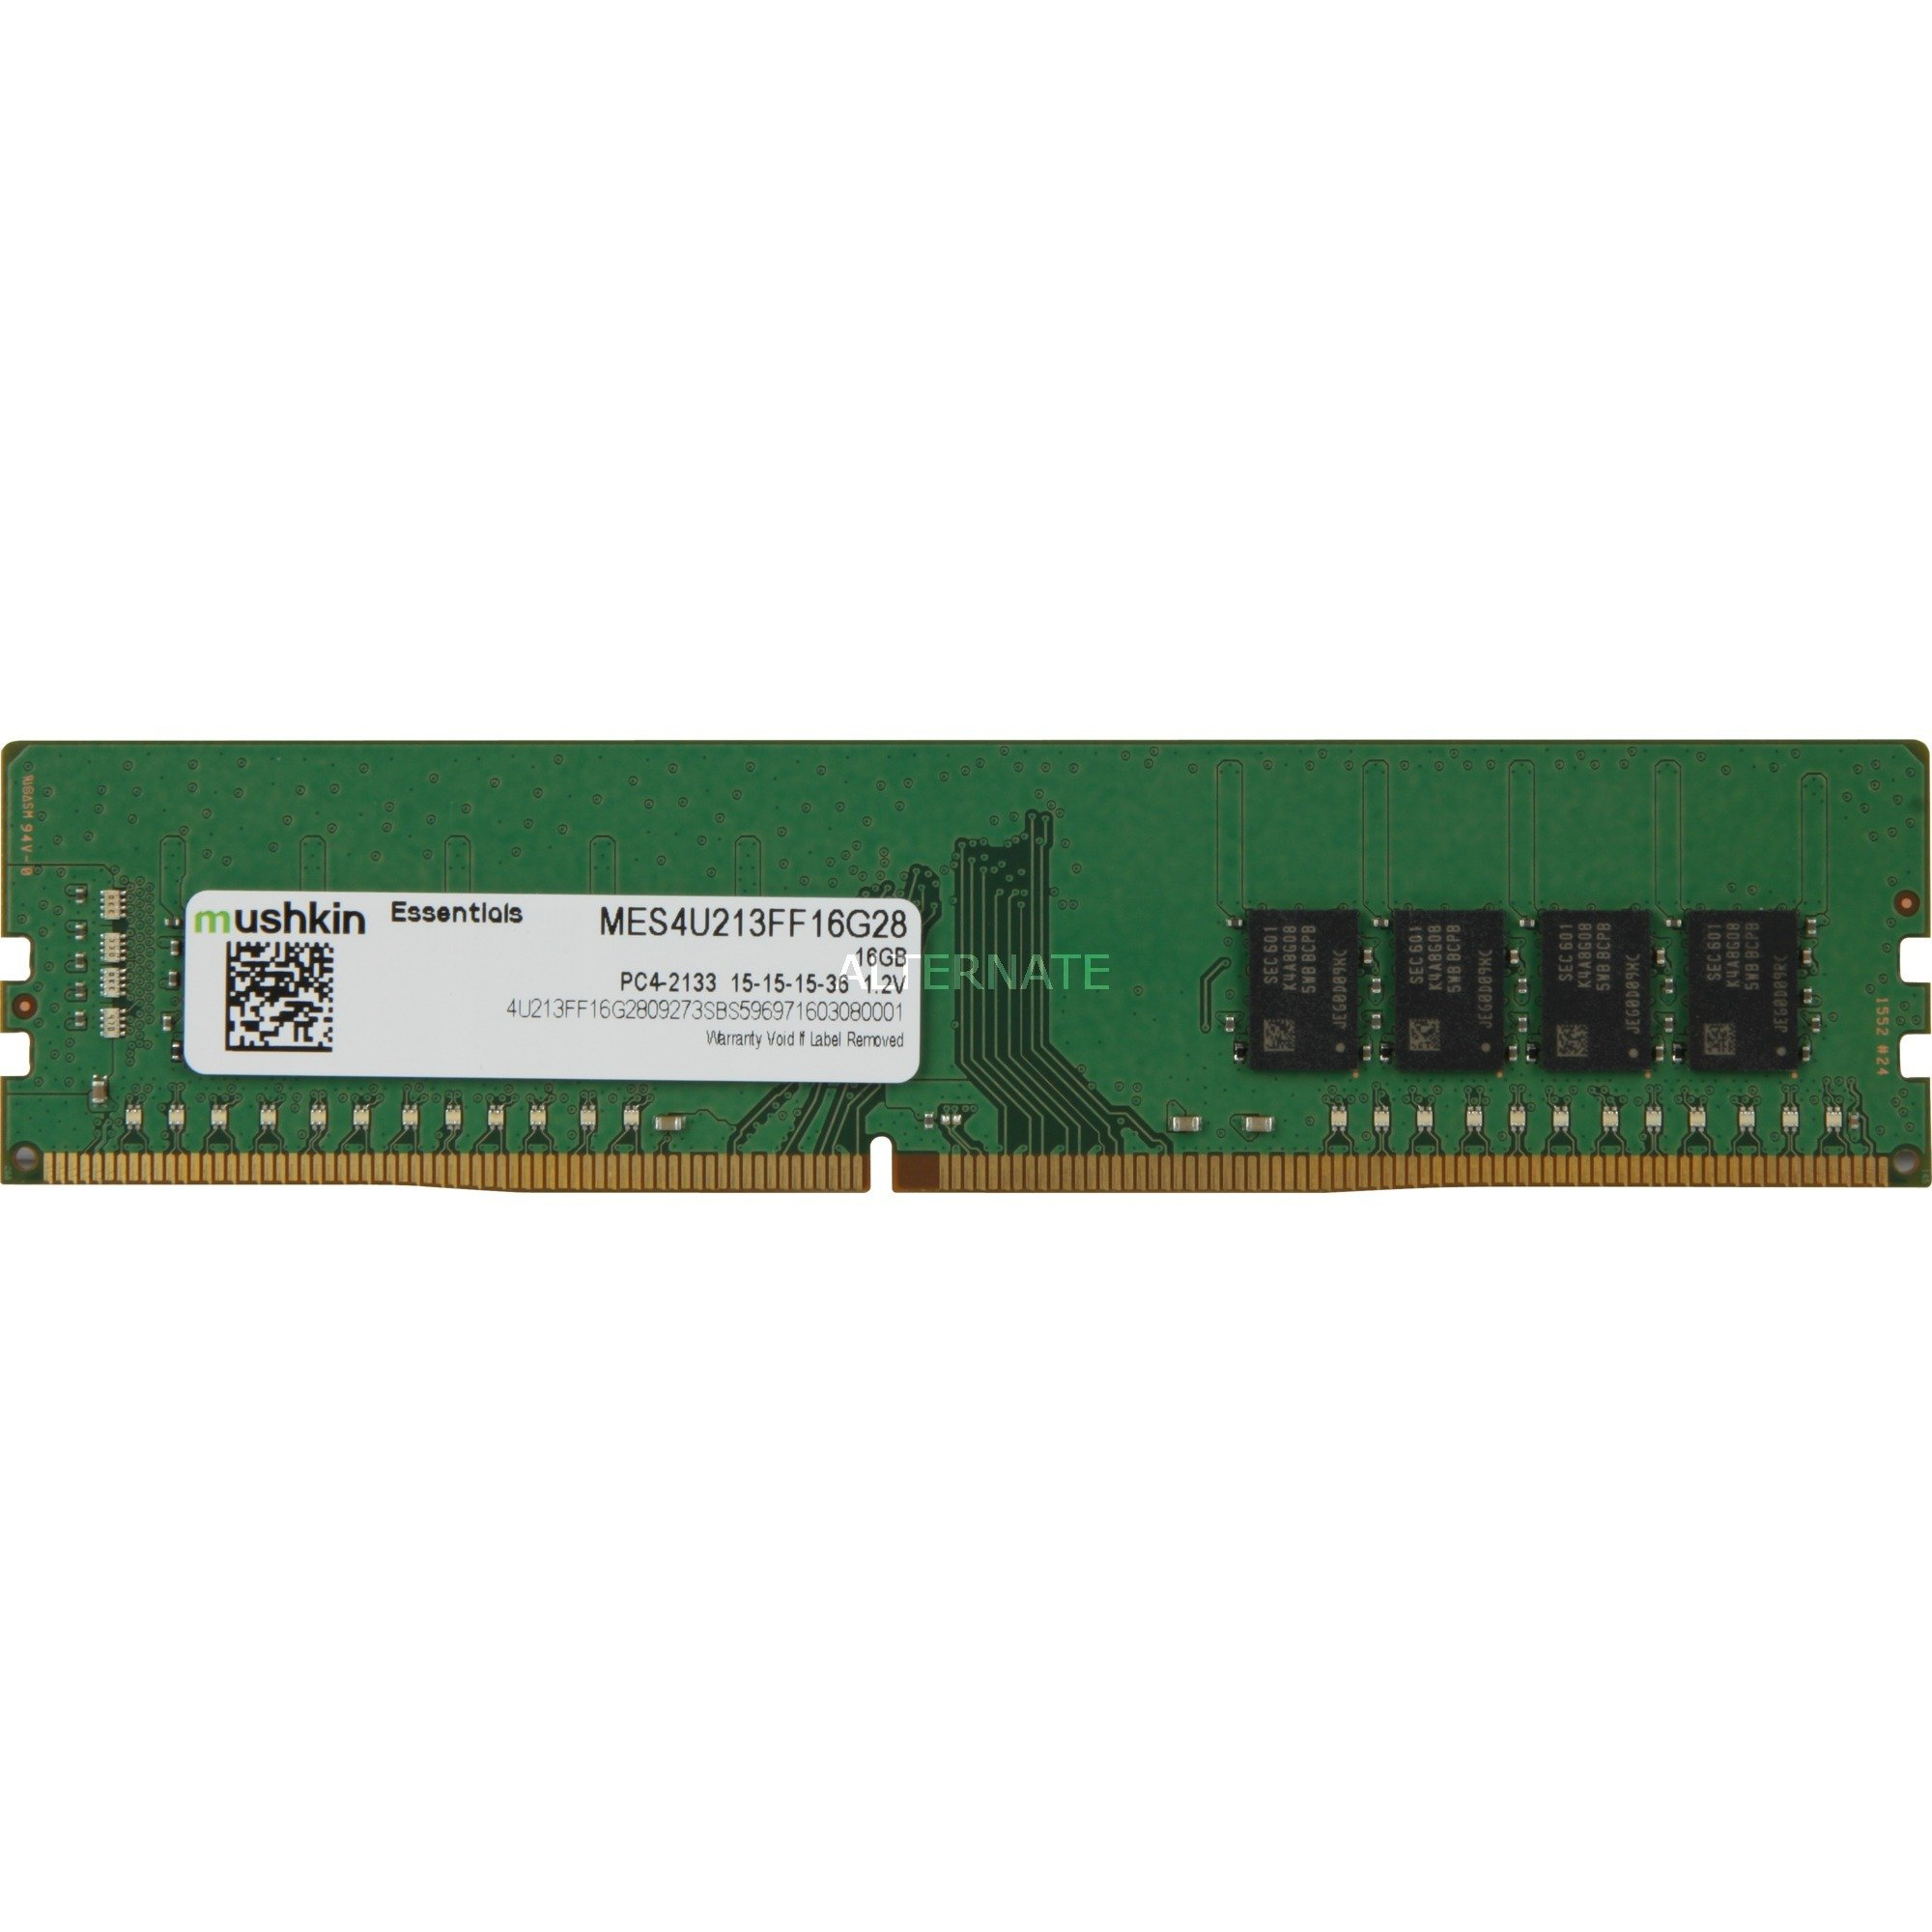 DIMM 16 GB DDR4-2133, Memoria RAM